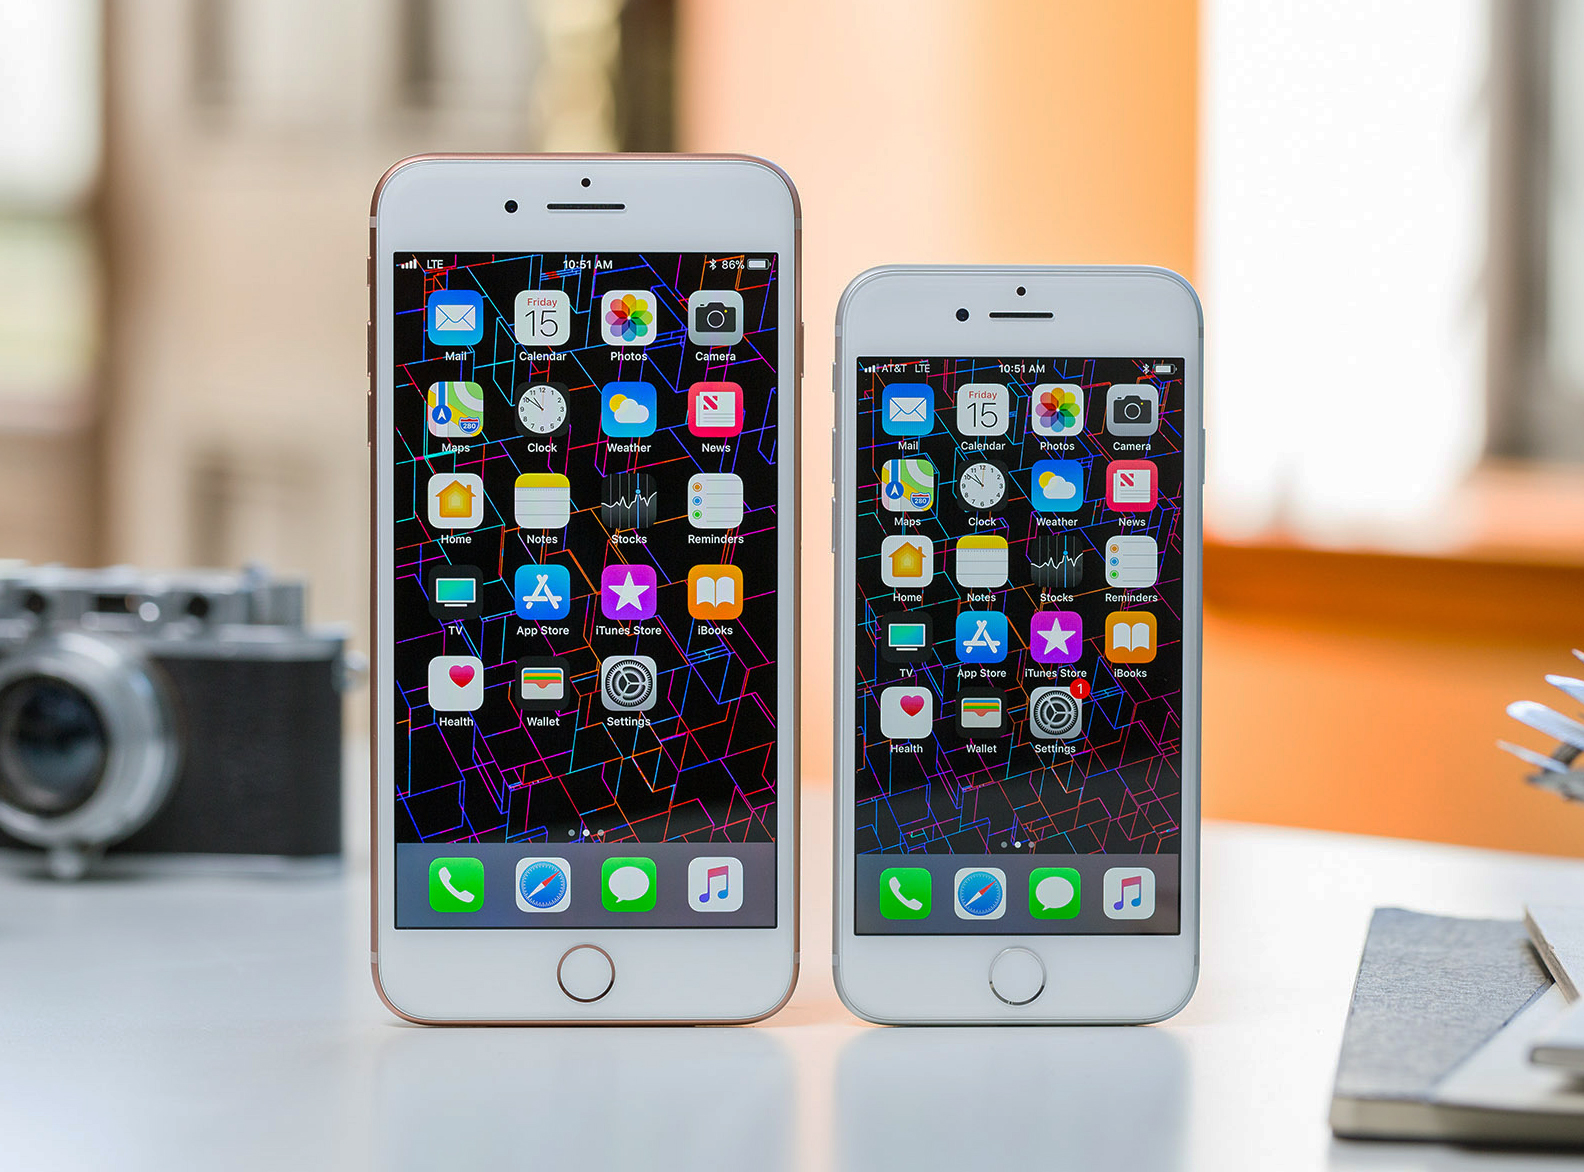 Beeline. ապառիկով գնեք iPhone 8 և տոկոսների փոխարեն վճարեք կապի համար